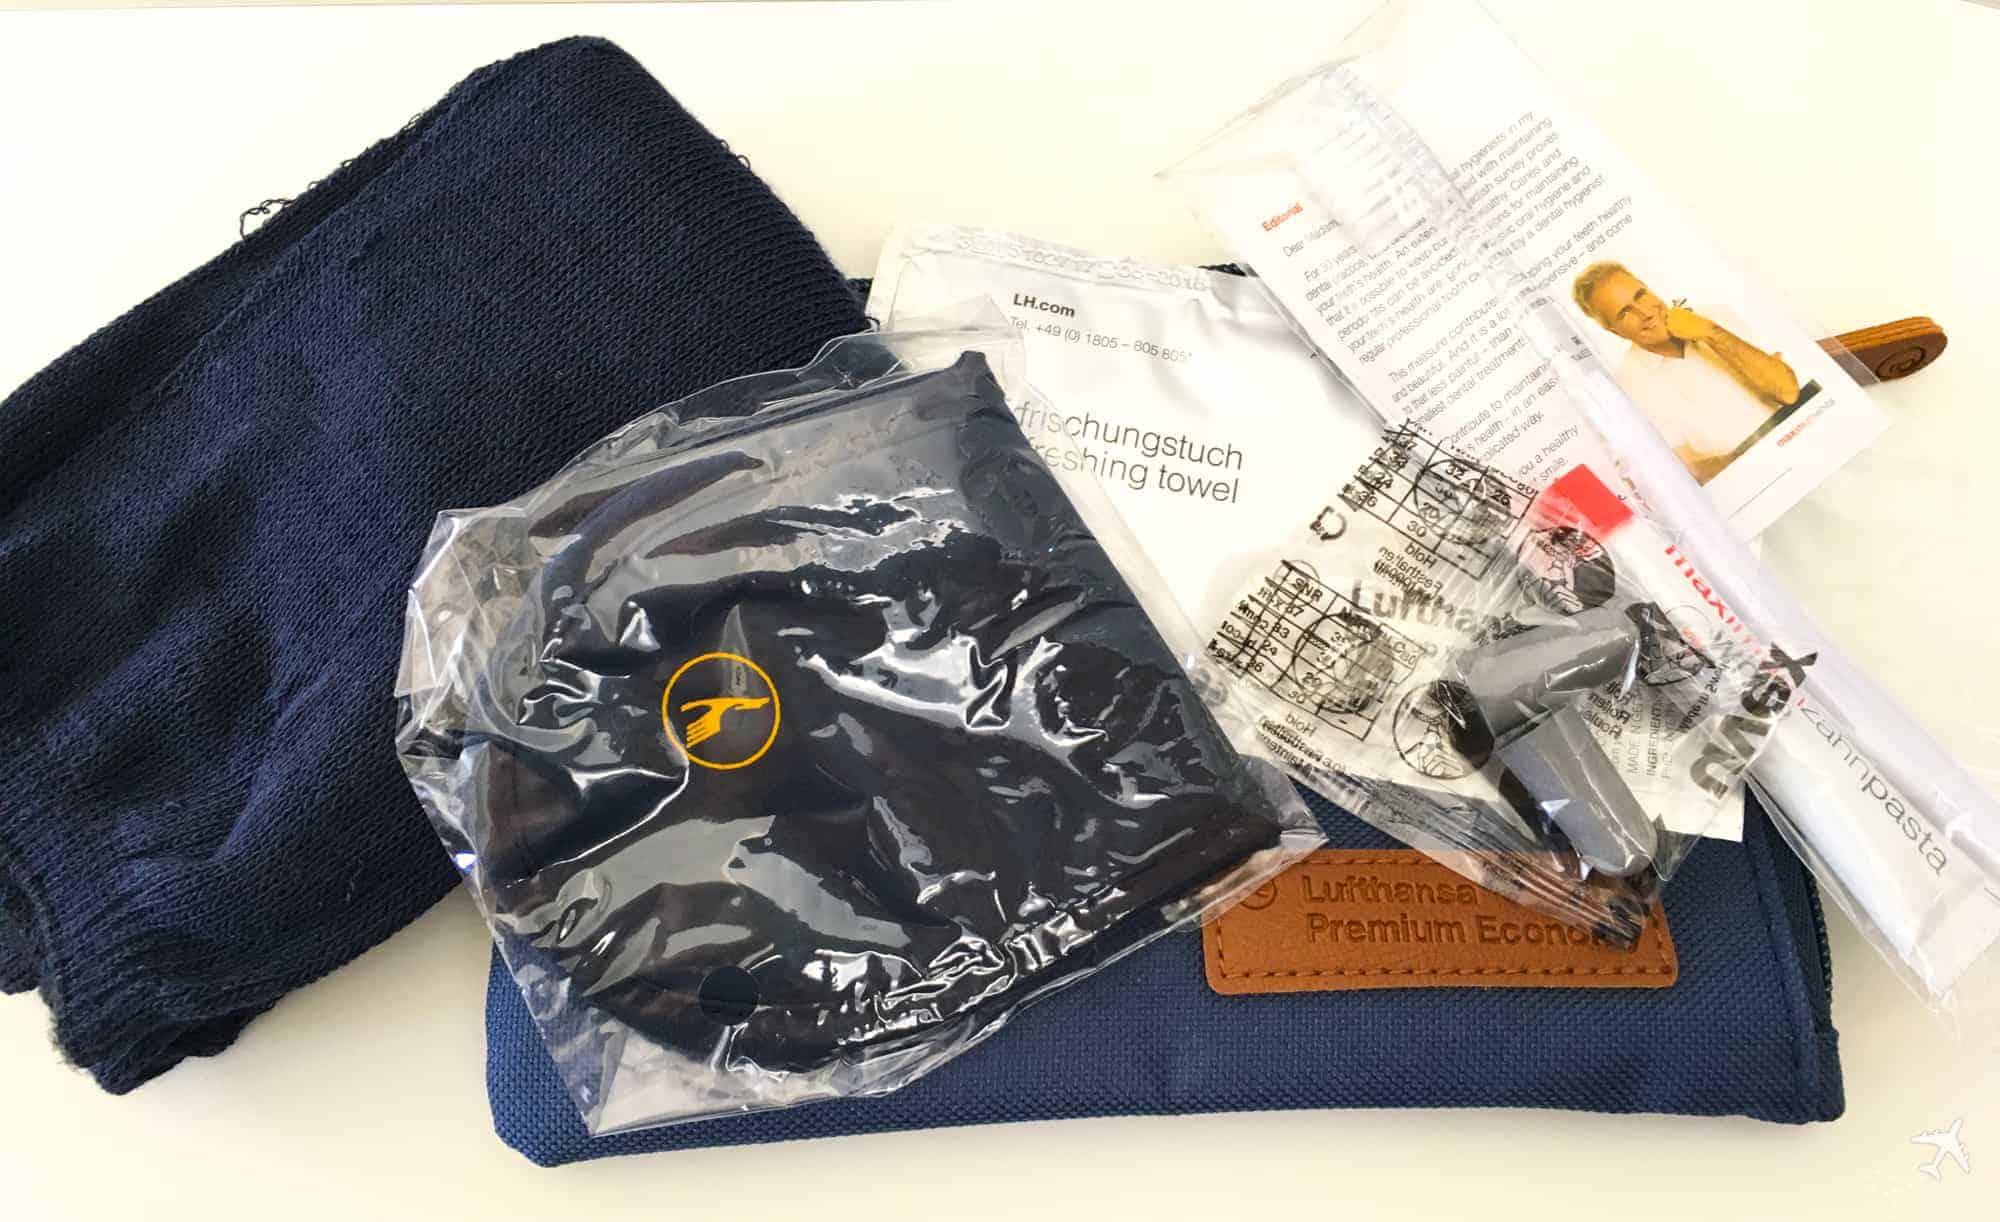 Lufthansa Premium Economy Class Amenity Kit Inhalt